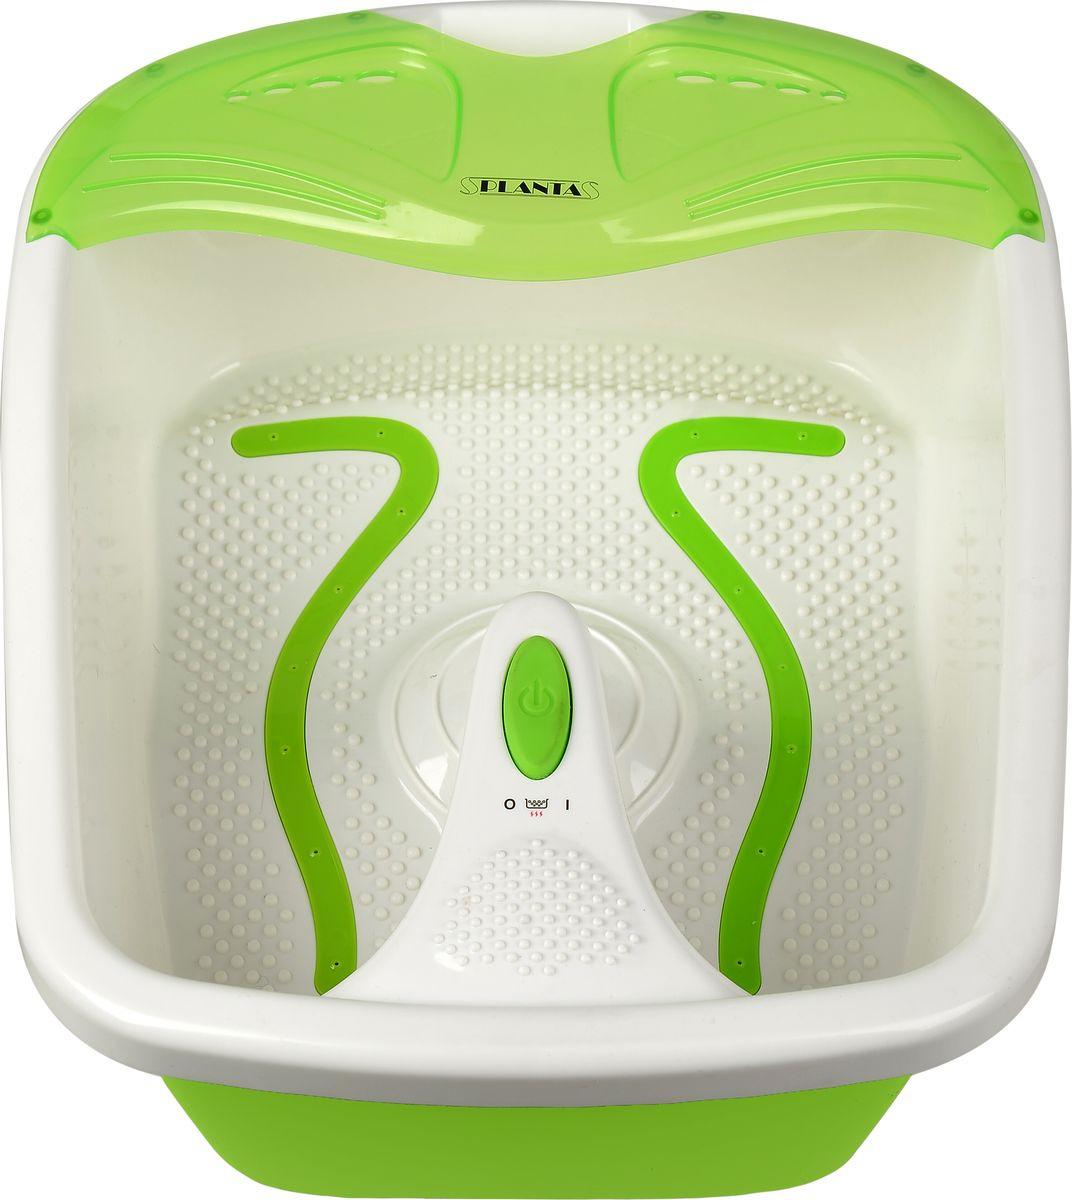 Гидромассажная ванна Planta Home Spa, для ног, MFS-100G